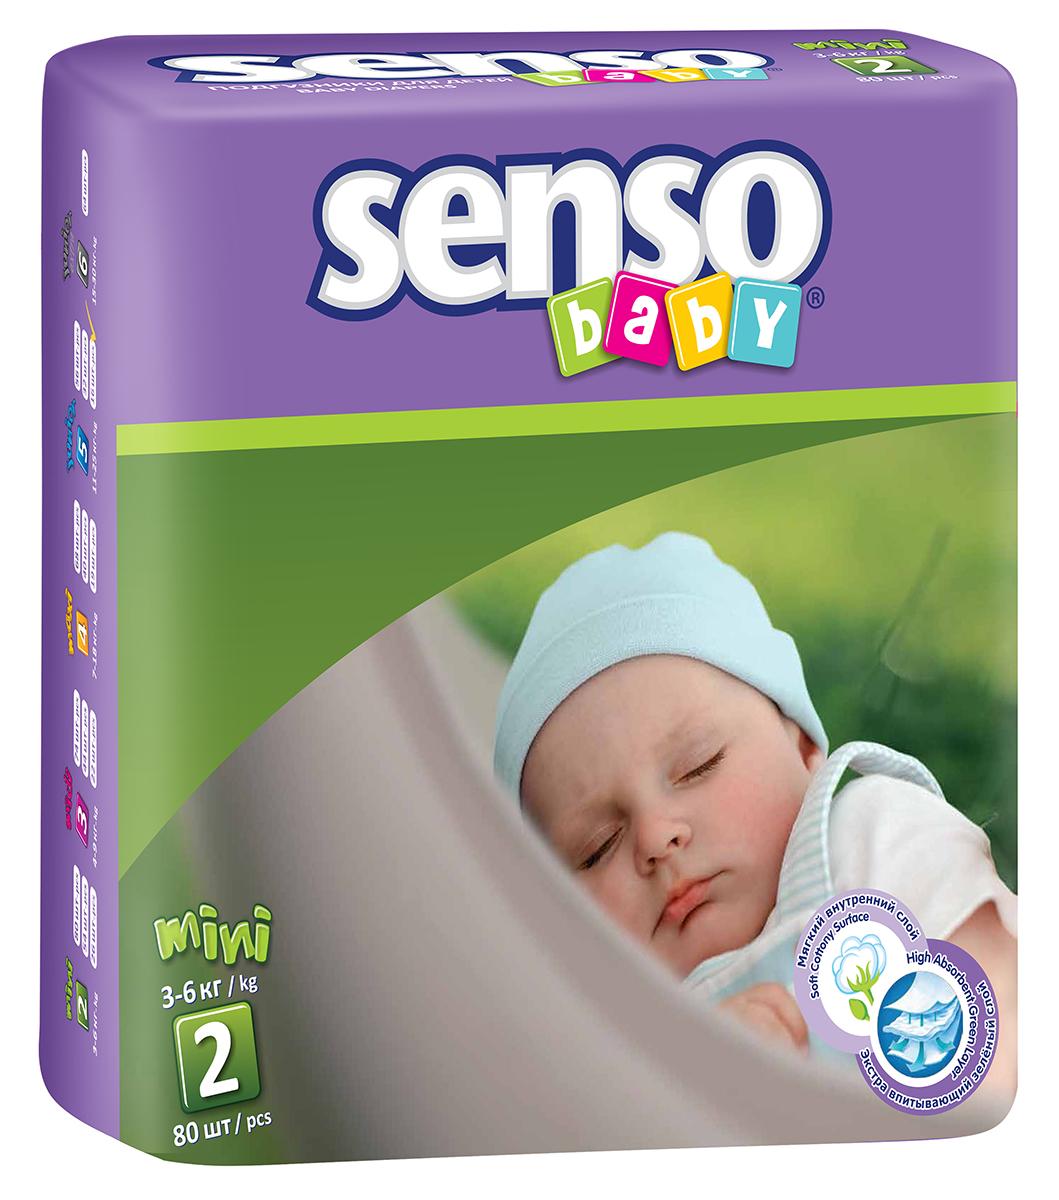 Senso Baby Подгузники детские Mini 3-6 кг 80 шт300021